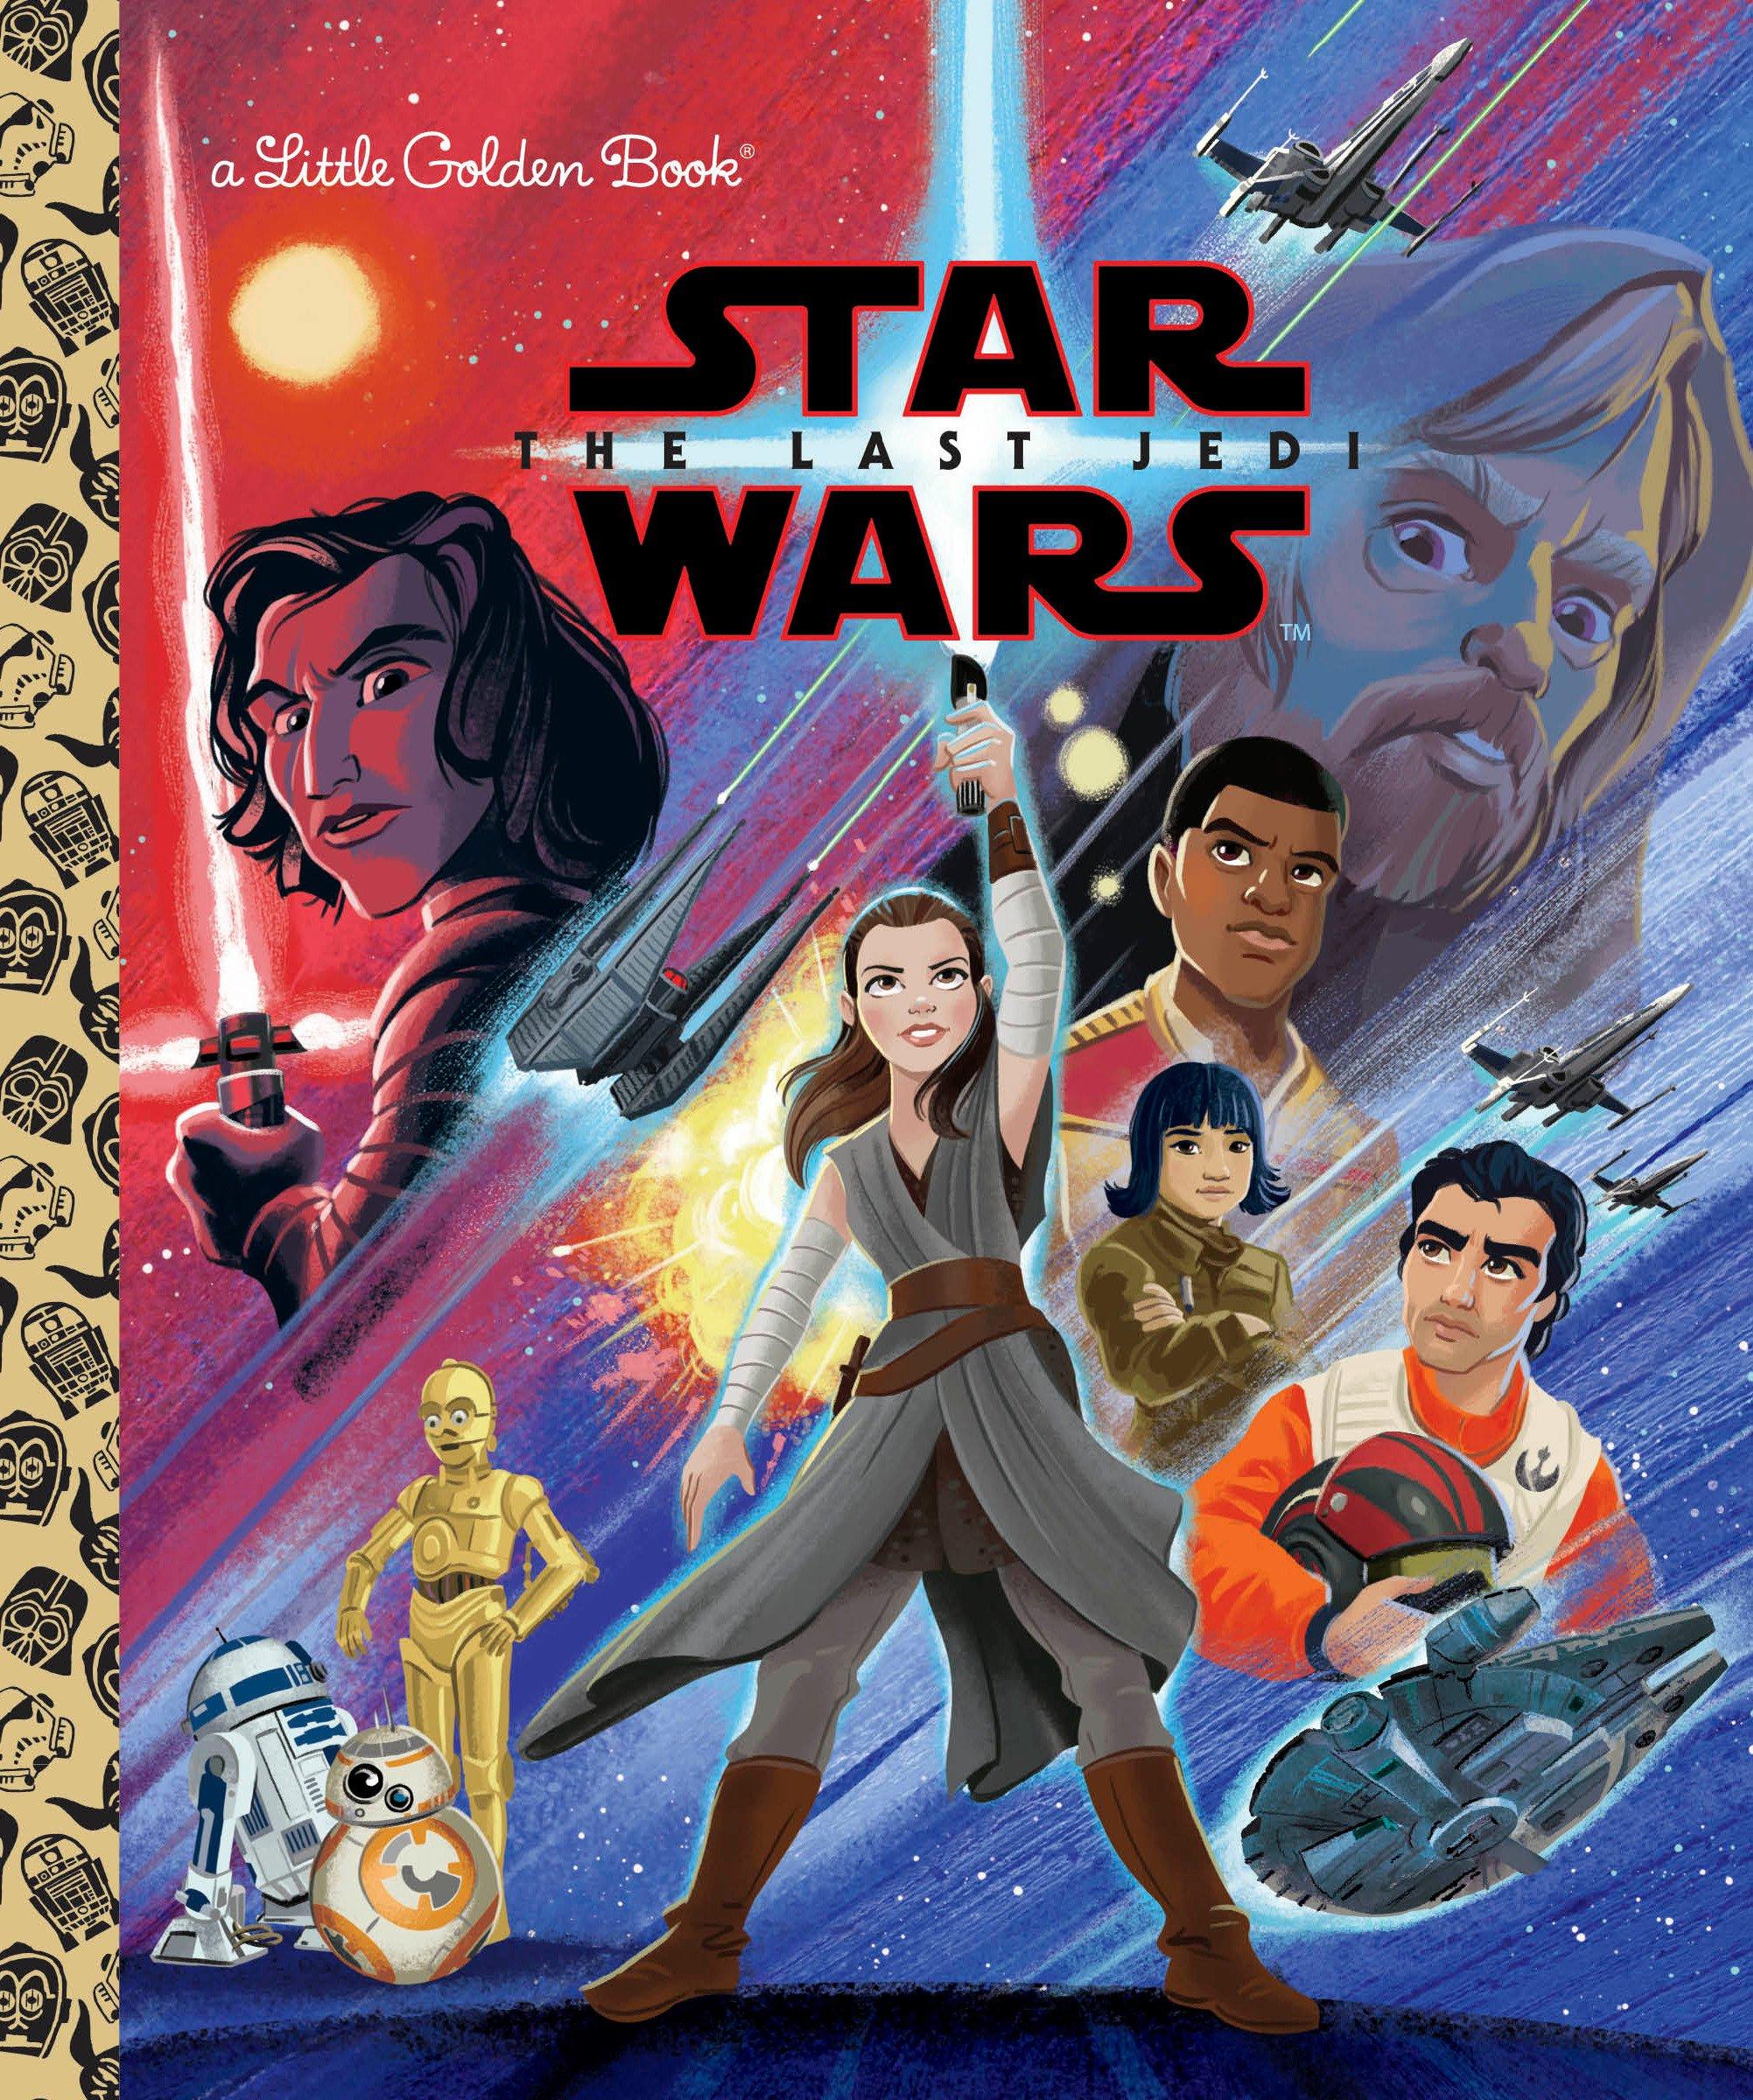 Star Wars: The Last Jedi (Star Wars) (Little Golden Book): Elizabeth  Schaefer, Alan Batson: 9780736435864: Amazon.com: Books